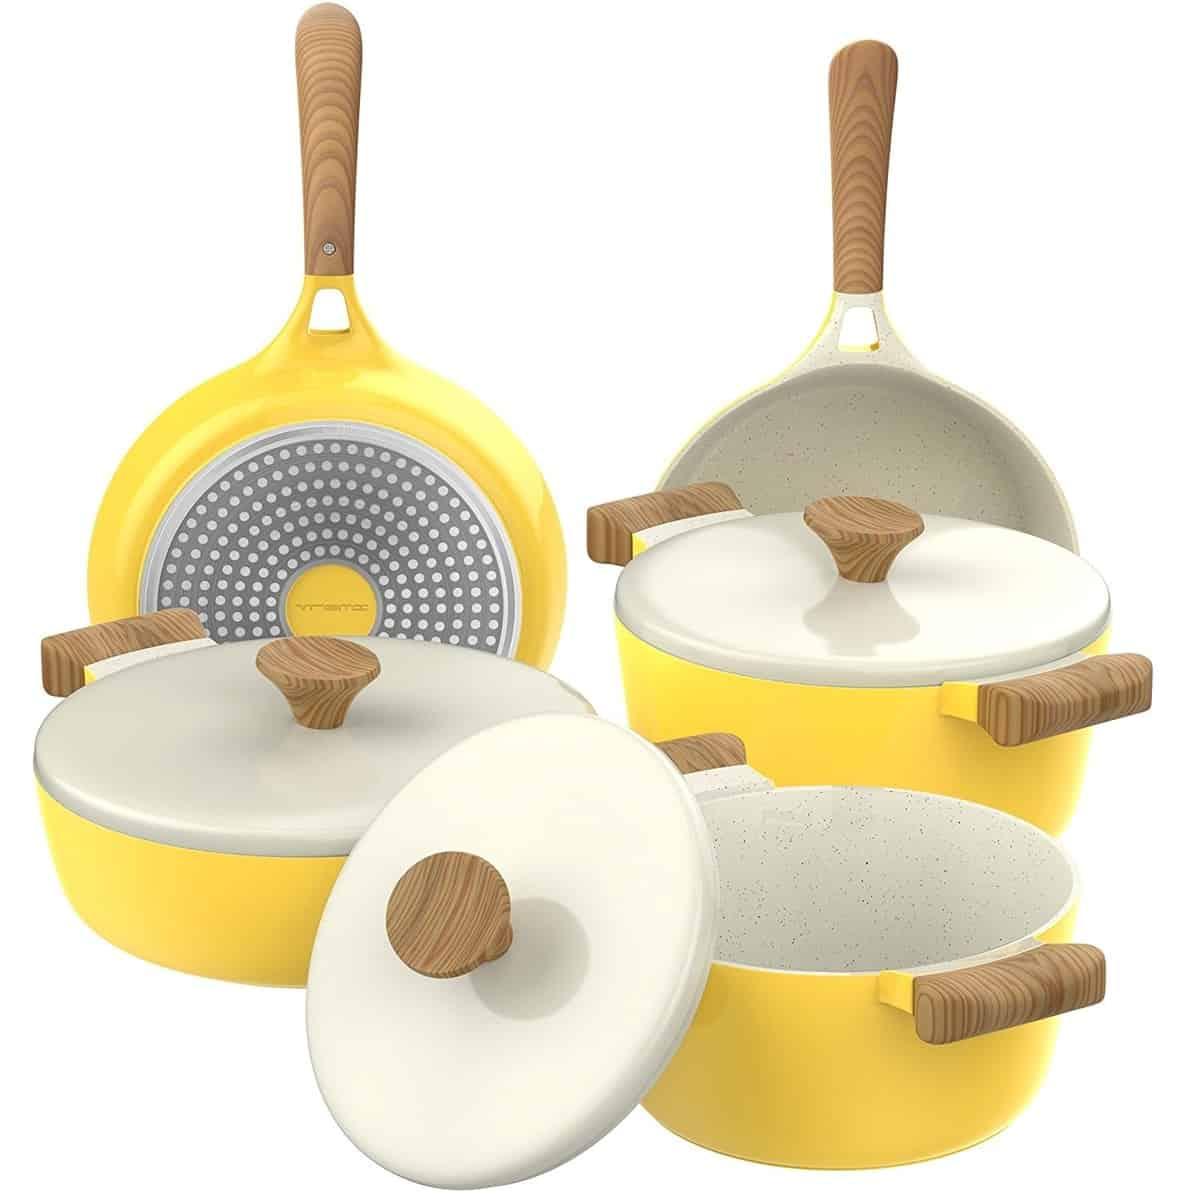 Vremi 8-Piece Ceramic Nonstick Cookware Set, Induction Stovetop Compatible Dish, Best ceramic cookware